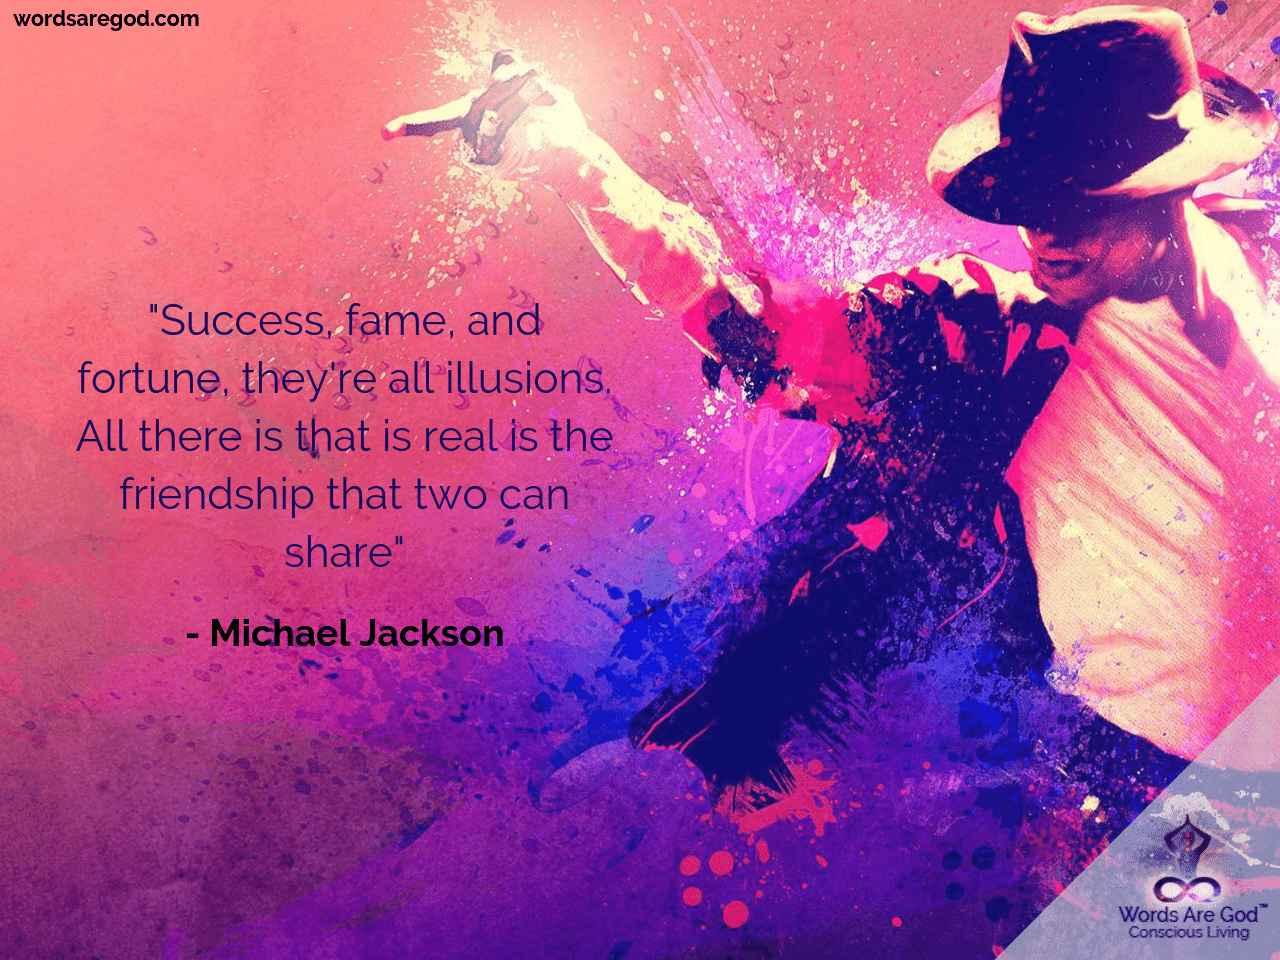 Michael Jackson Best Quote by Michael Jackson